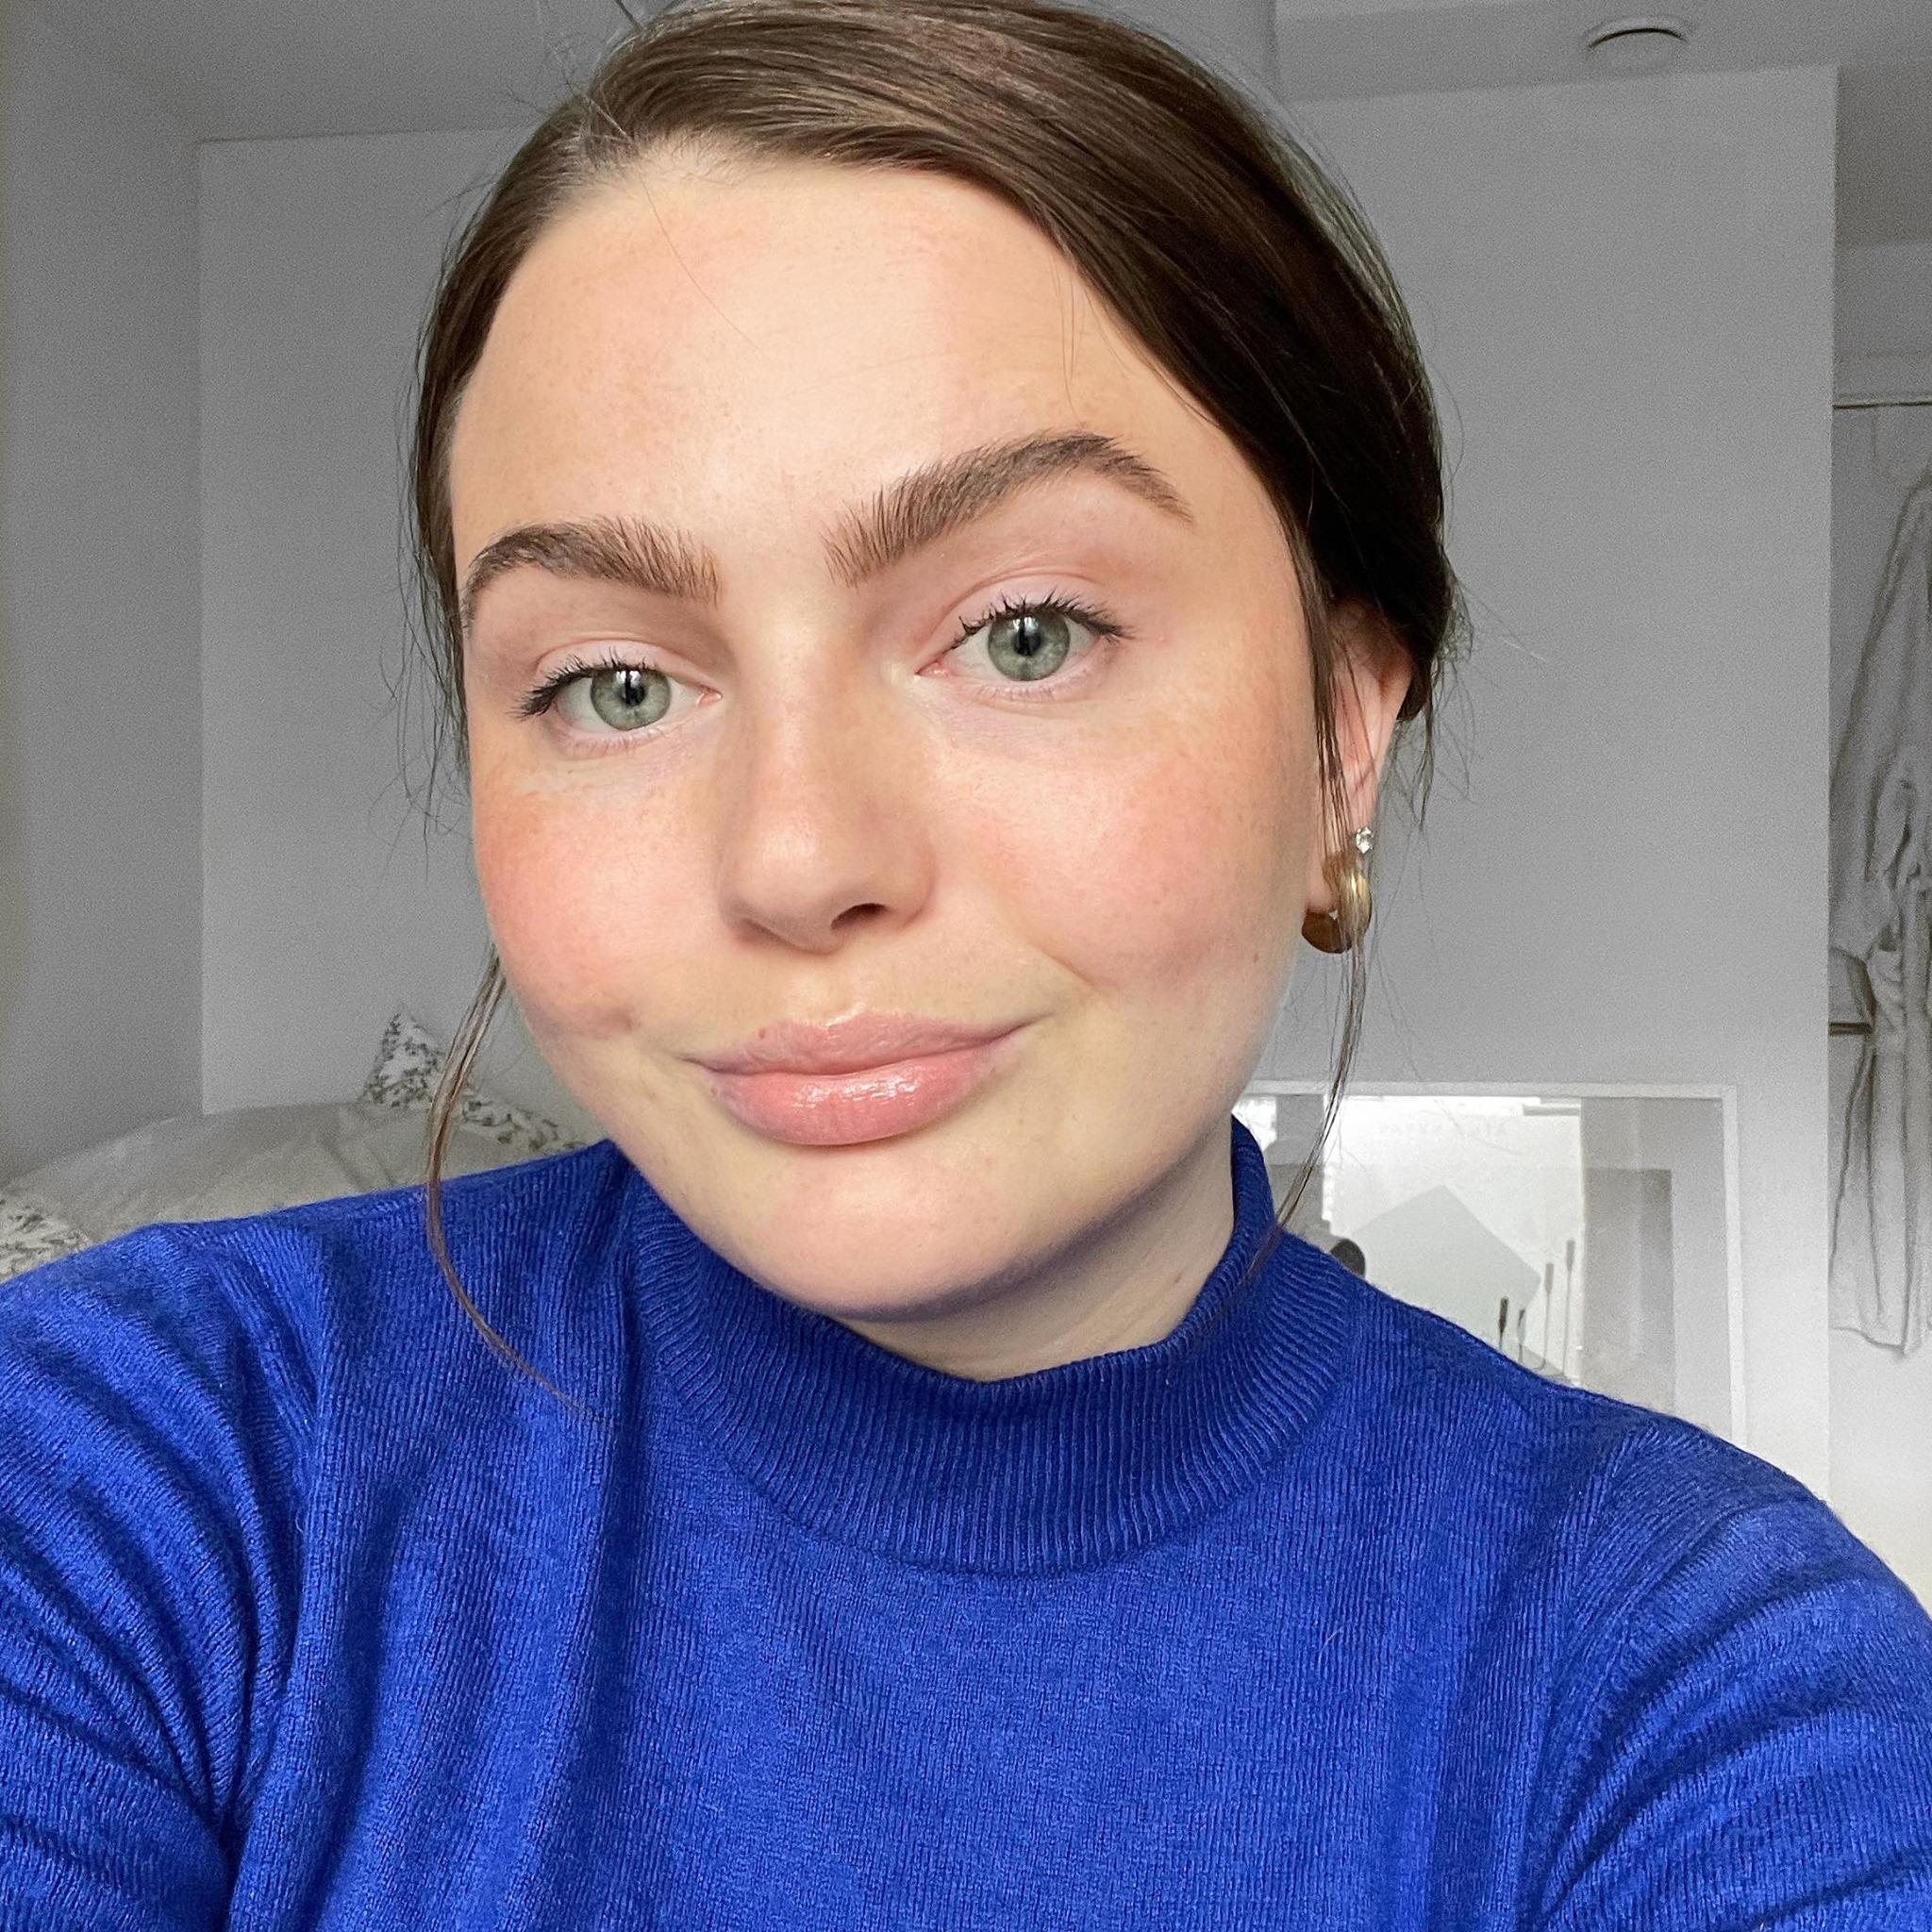 Klara Kristensen